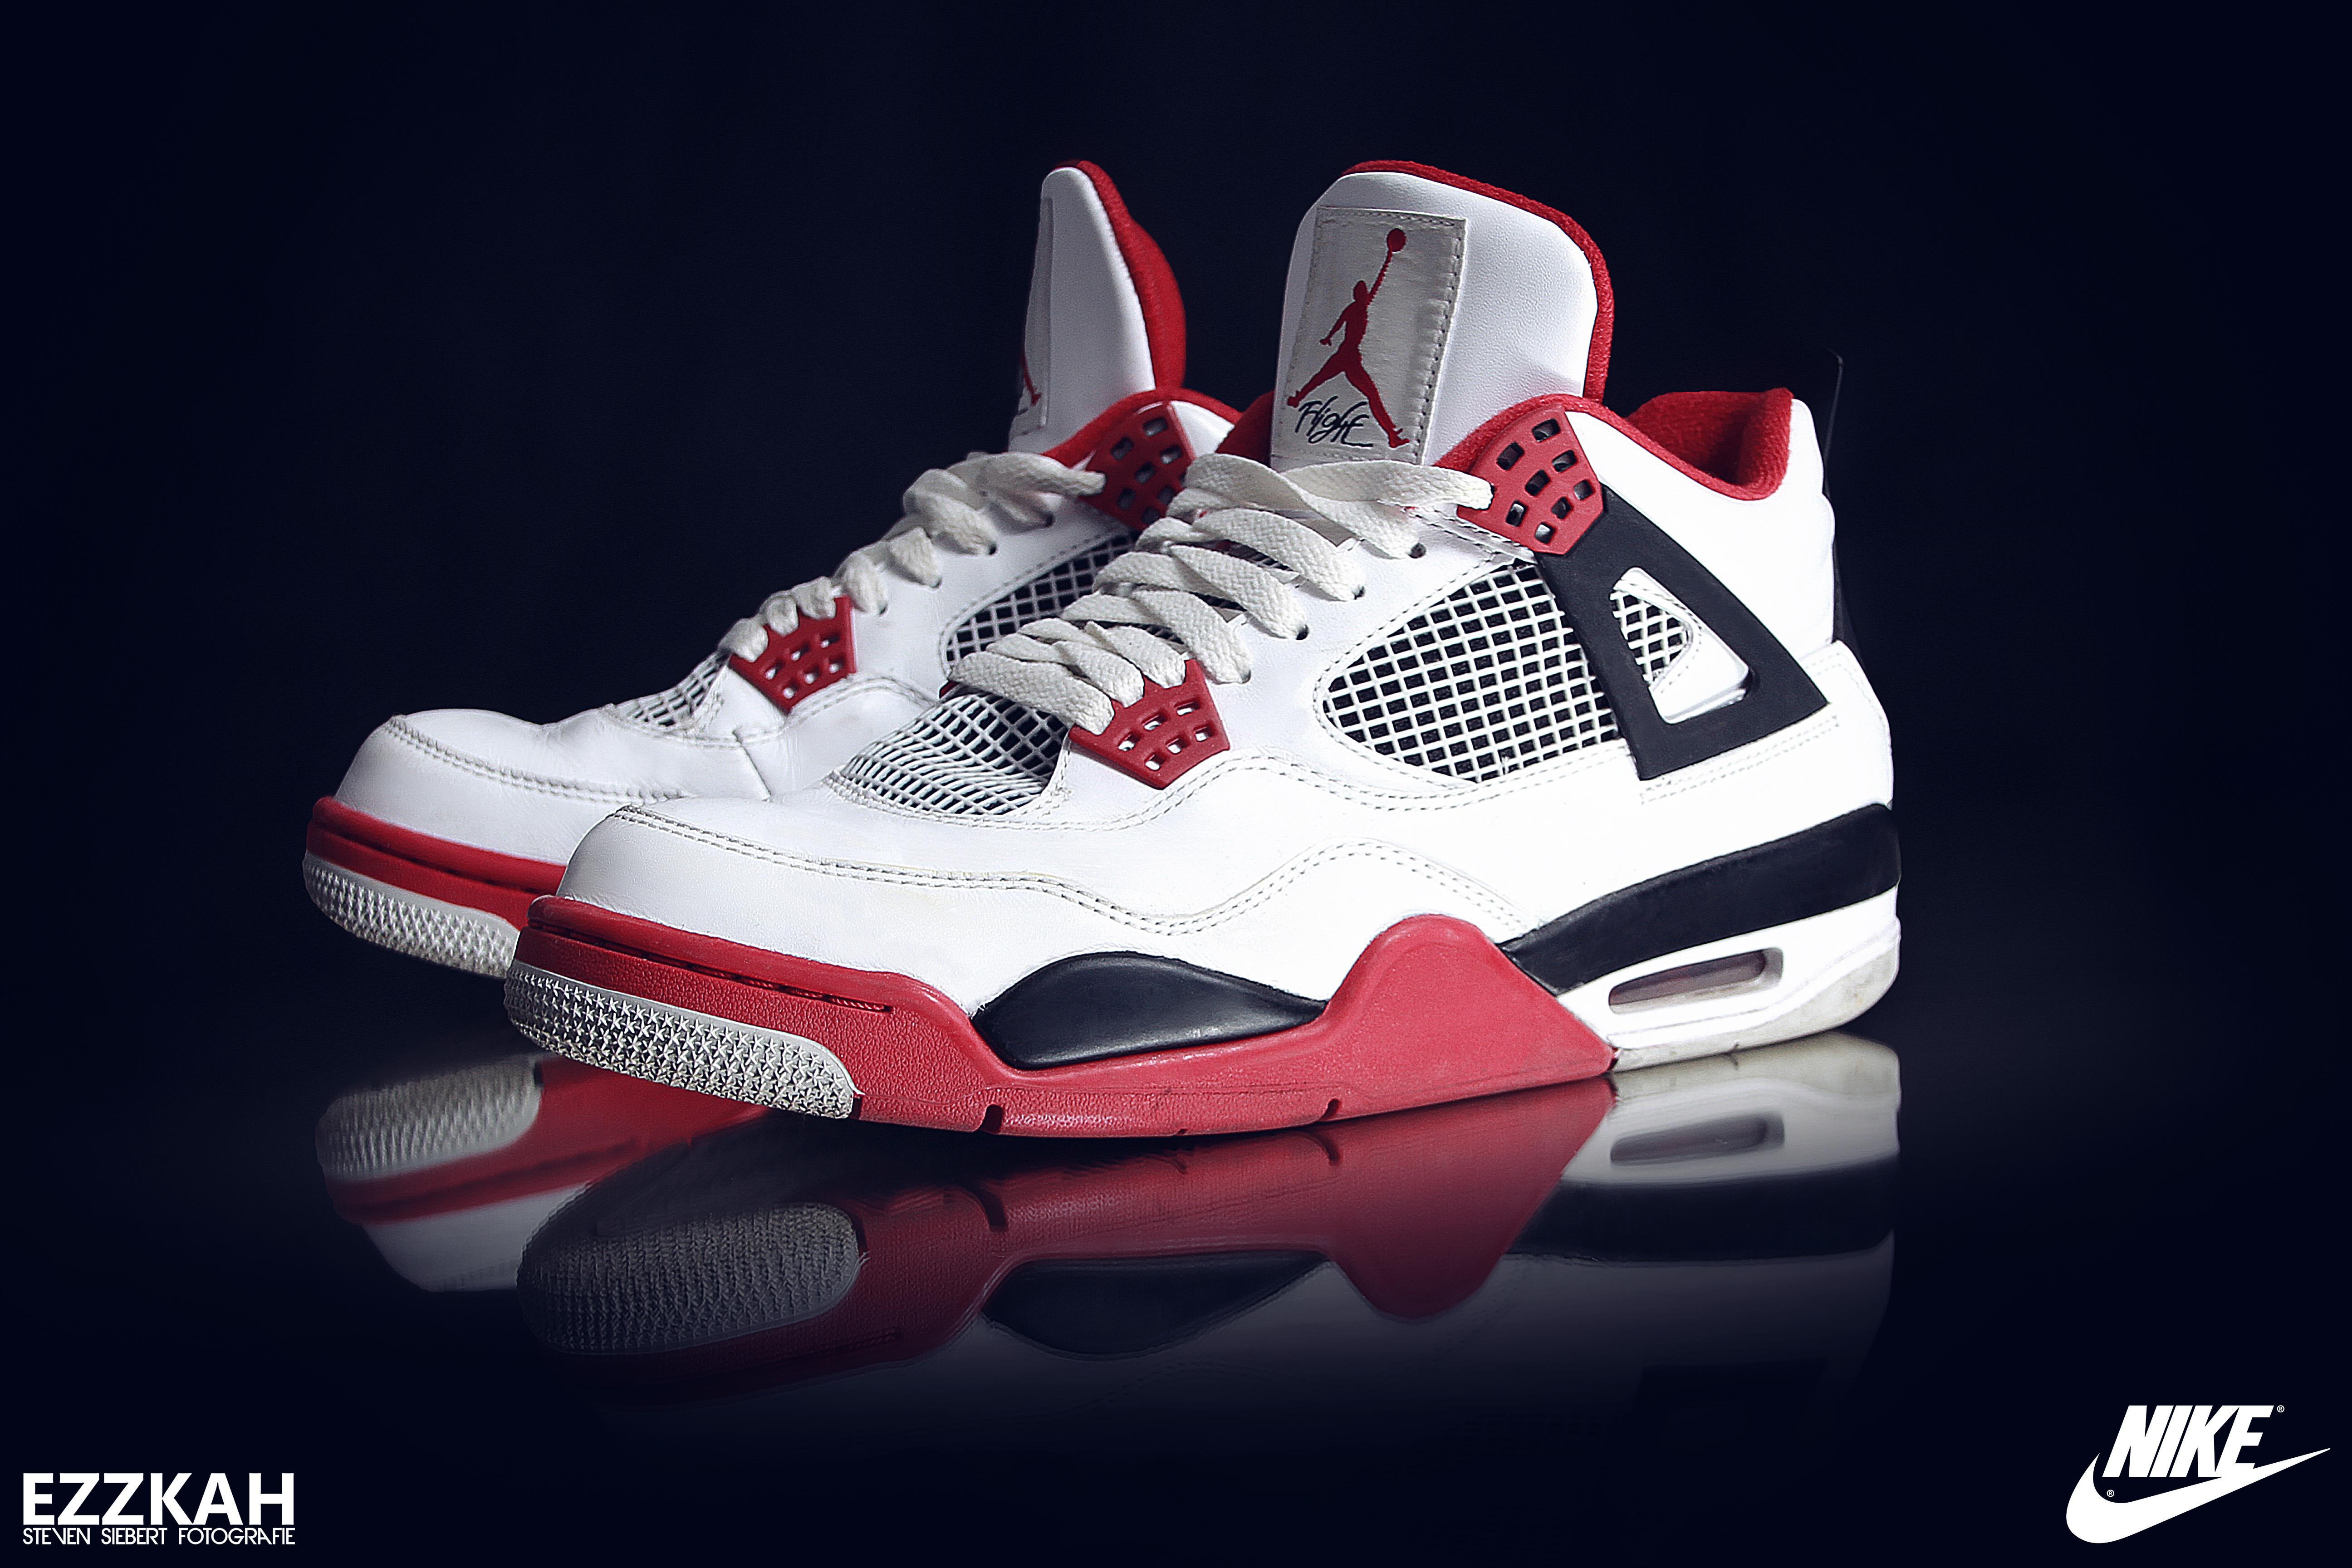 hot sale online 464a3 3dd32 Download Air Jordan 5 Wallpaper Gallery